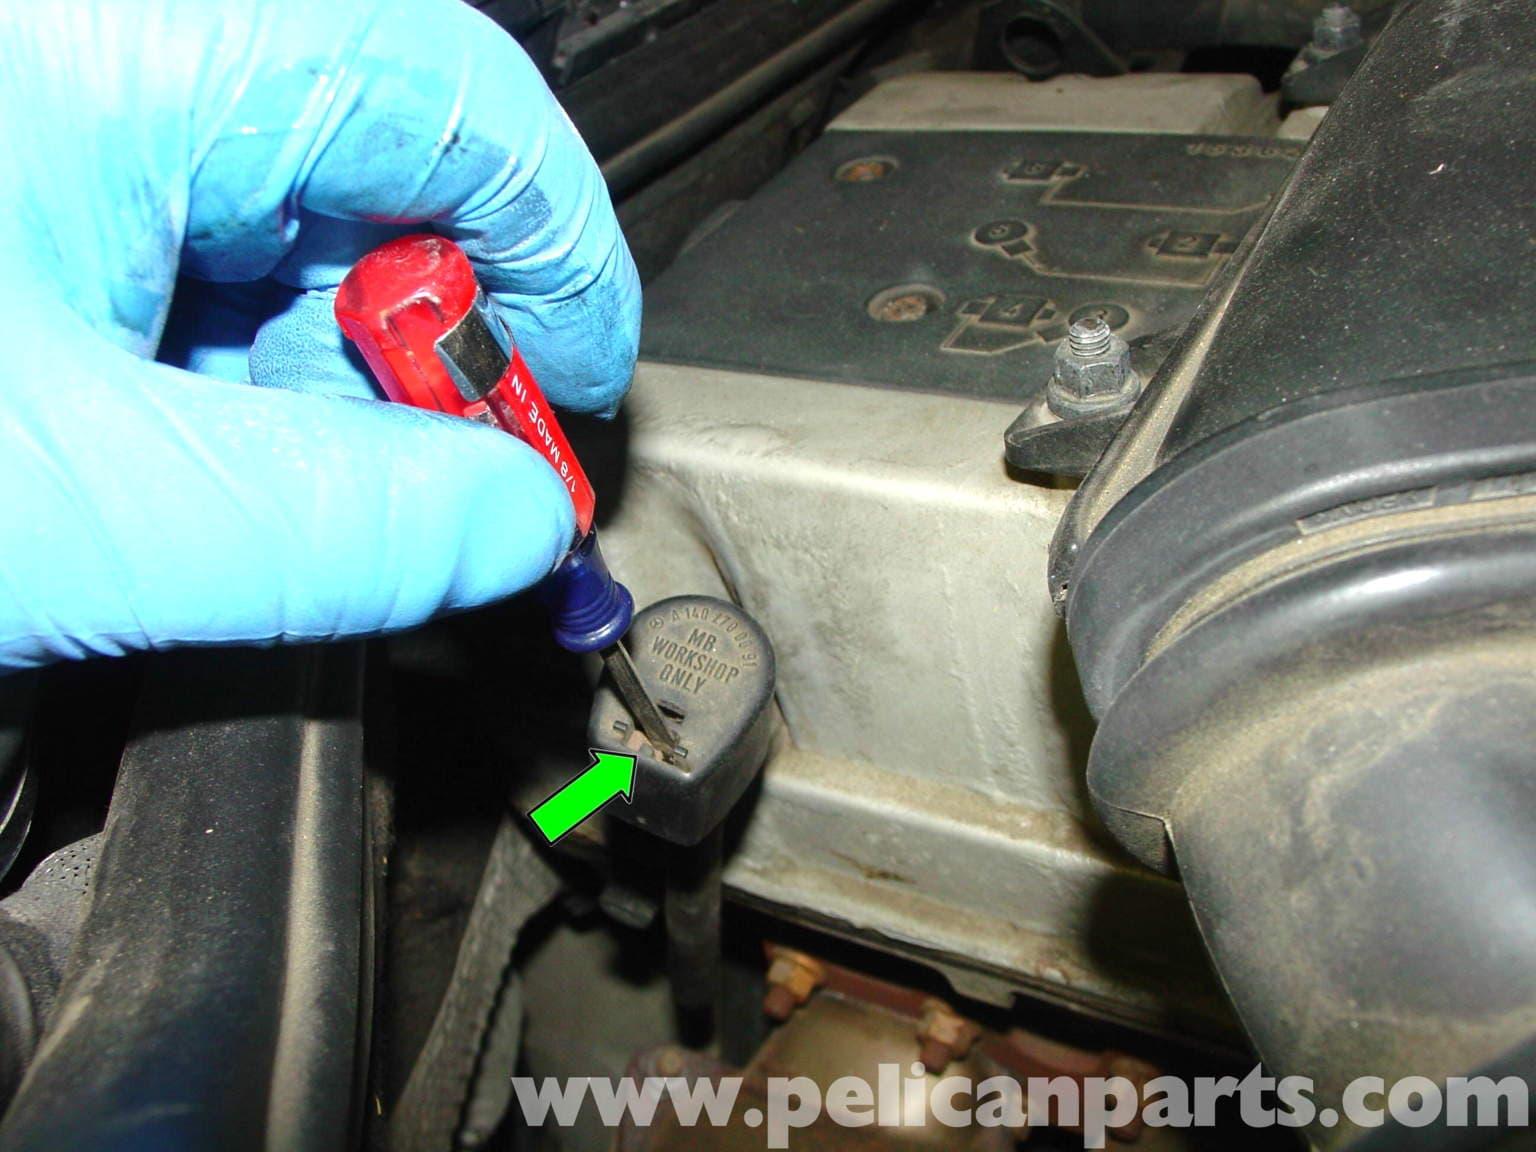 Mercedes benz w124 automatic transmission fluid and filter for Mercedes benz transmission oil